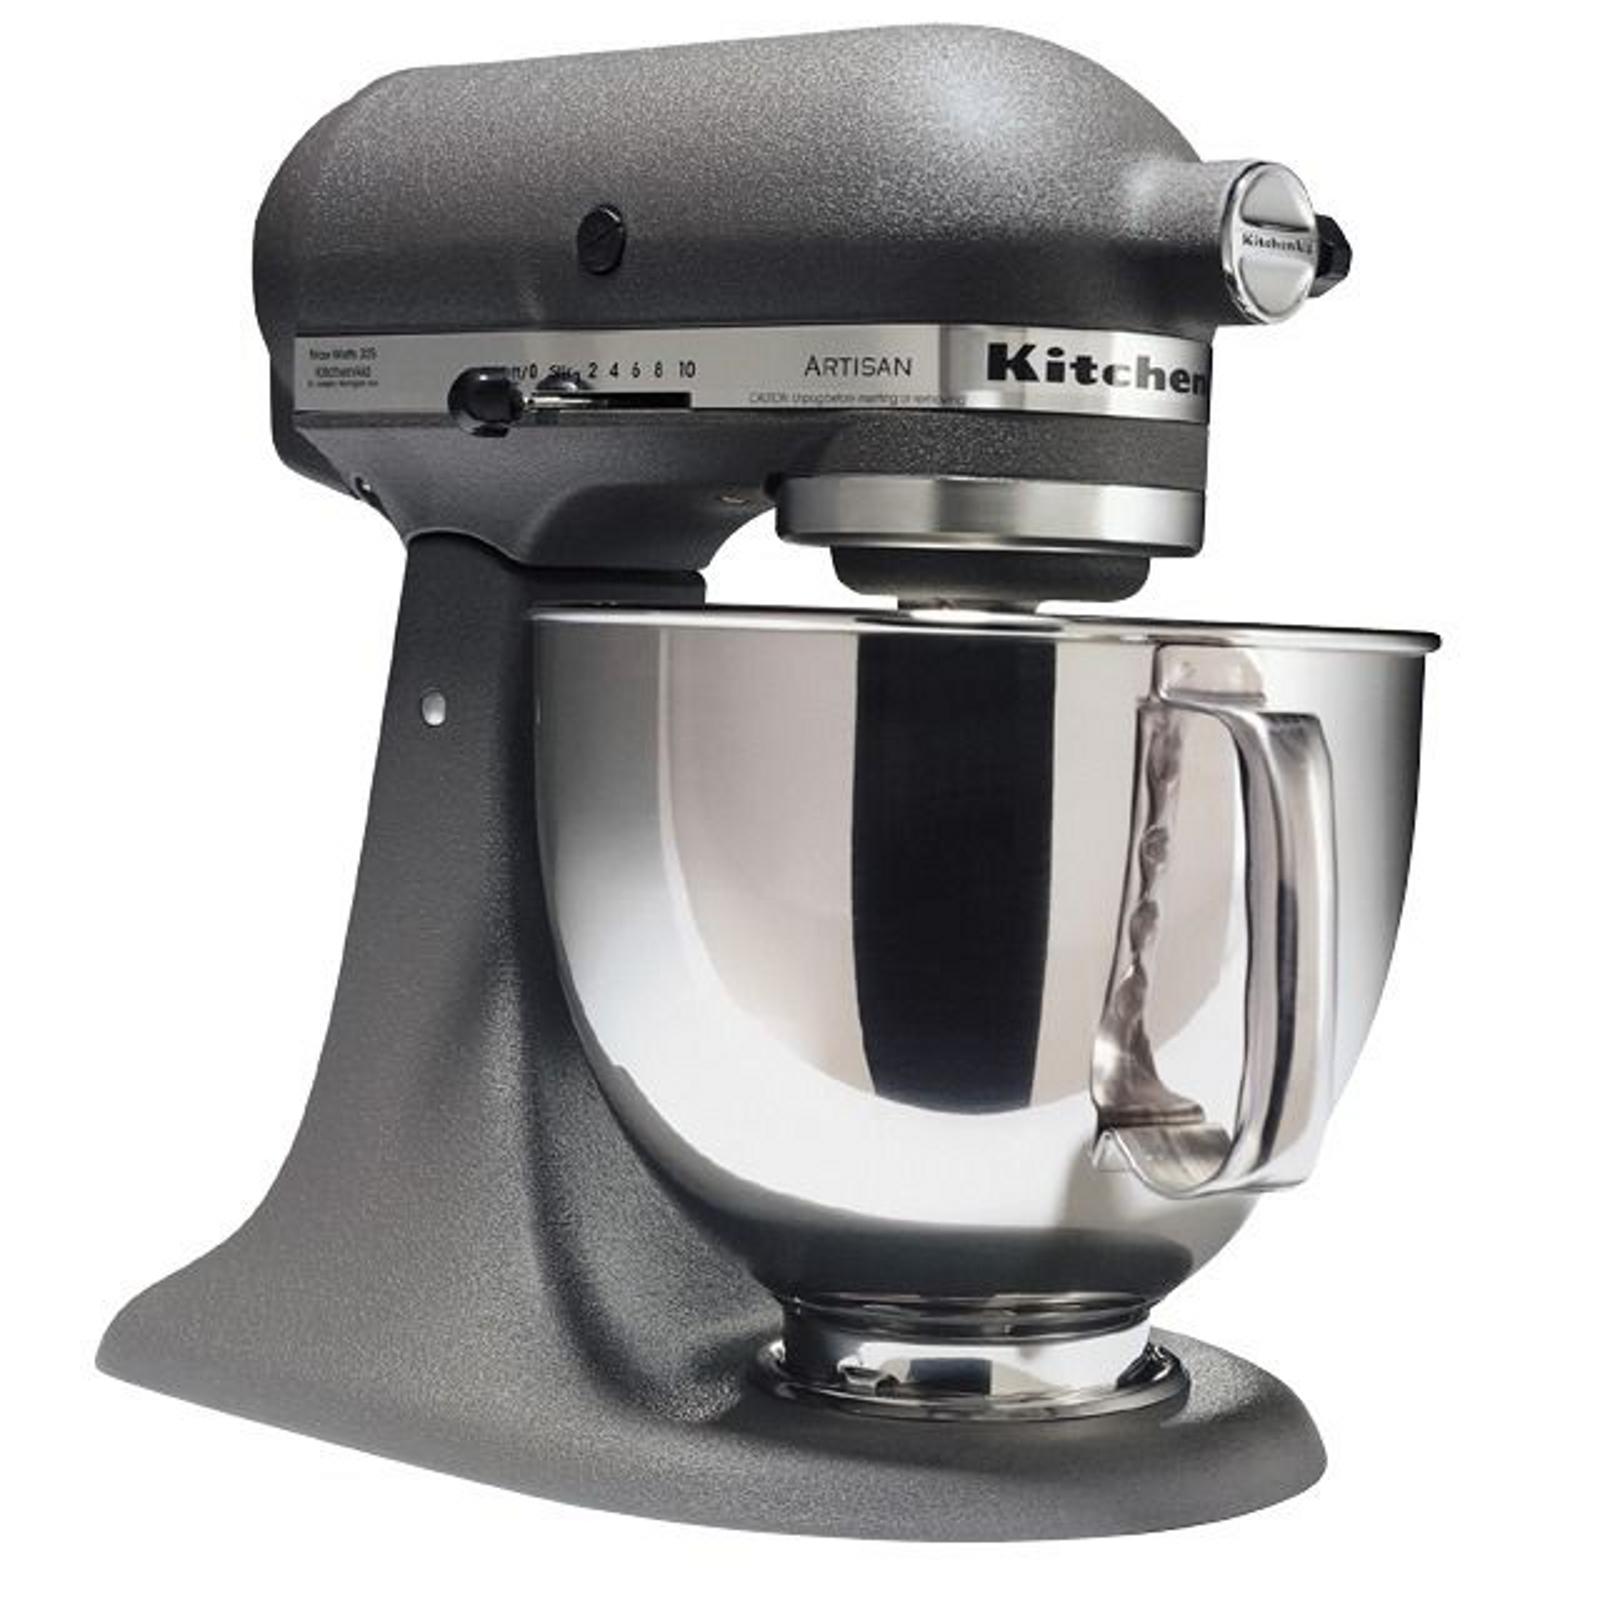 kitchenaid ksm150psgr artisan series imperial gray 5 quart stand mixer. Black Bedroom Furniture Sets. Home Design Ideas